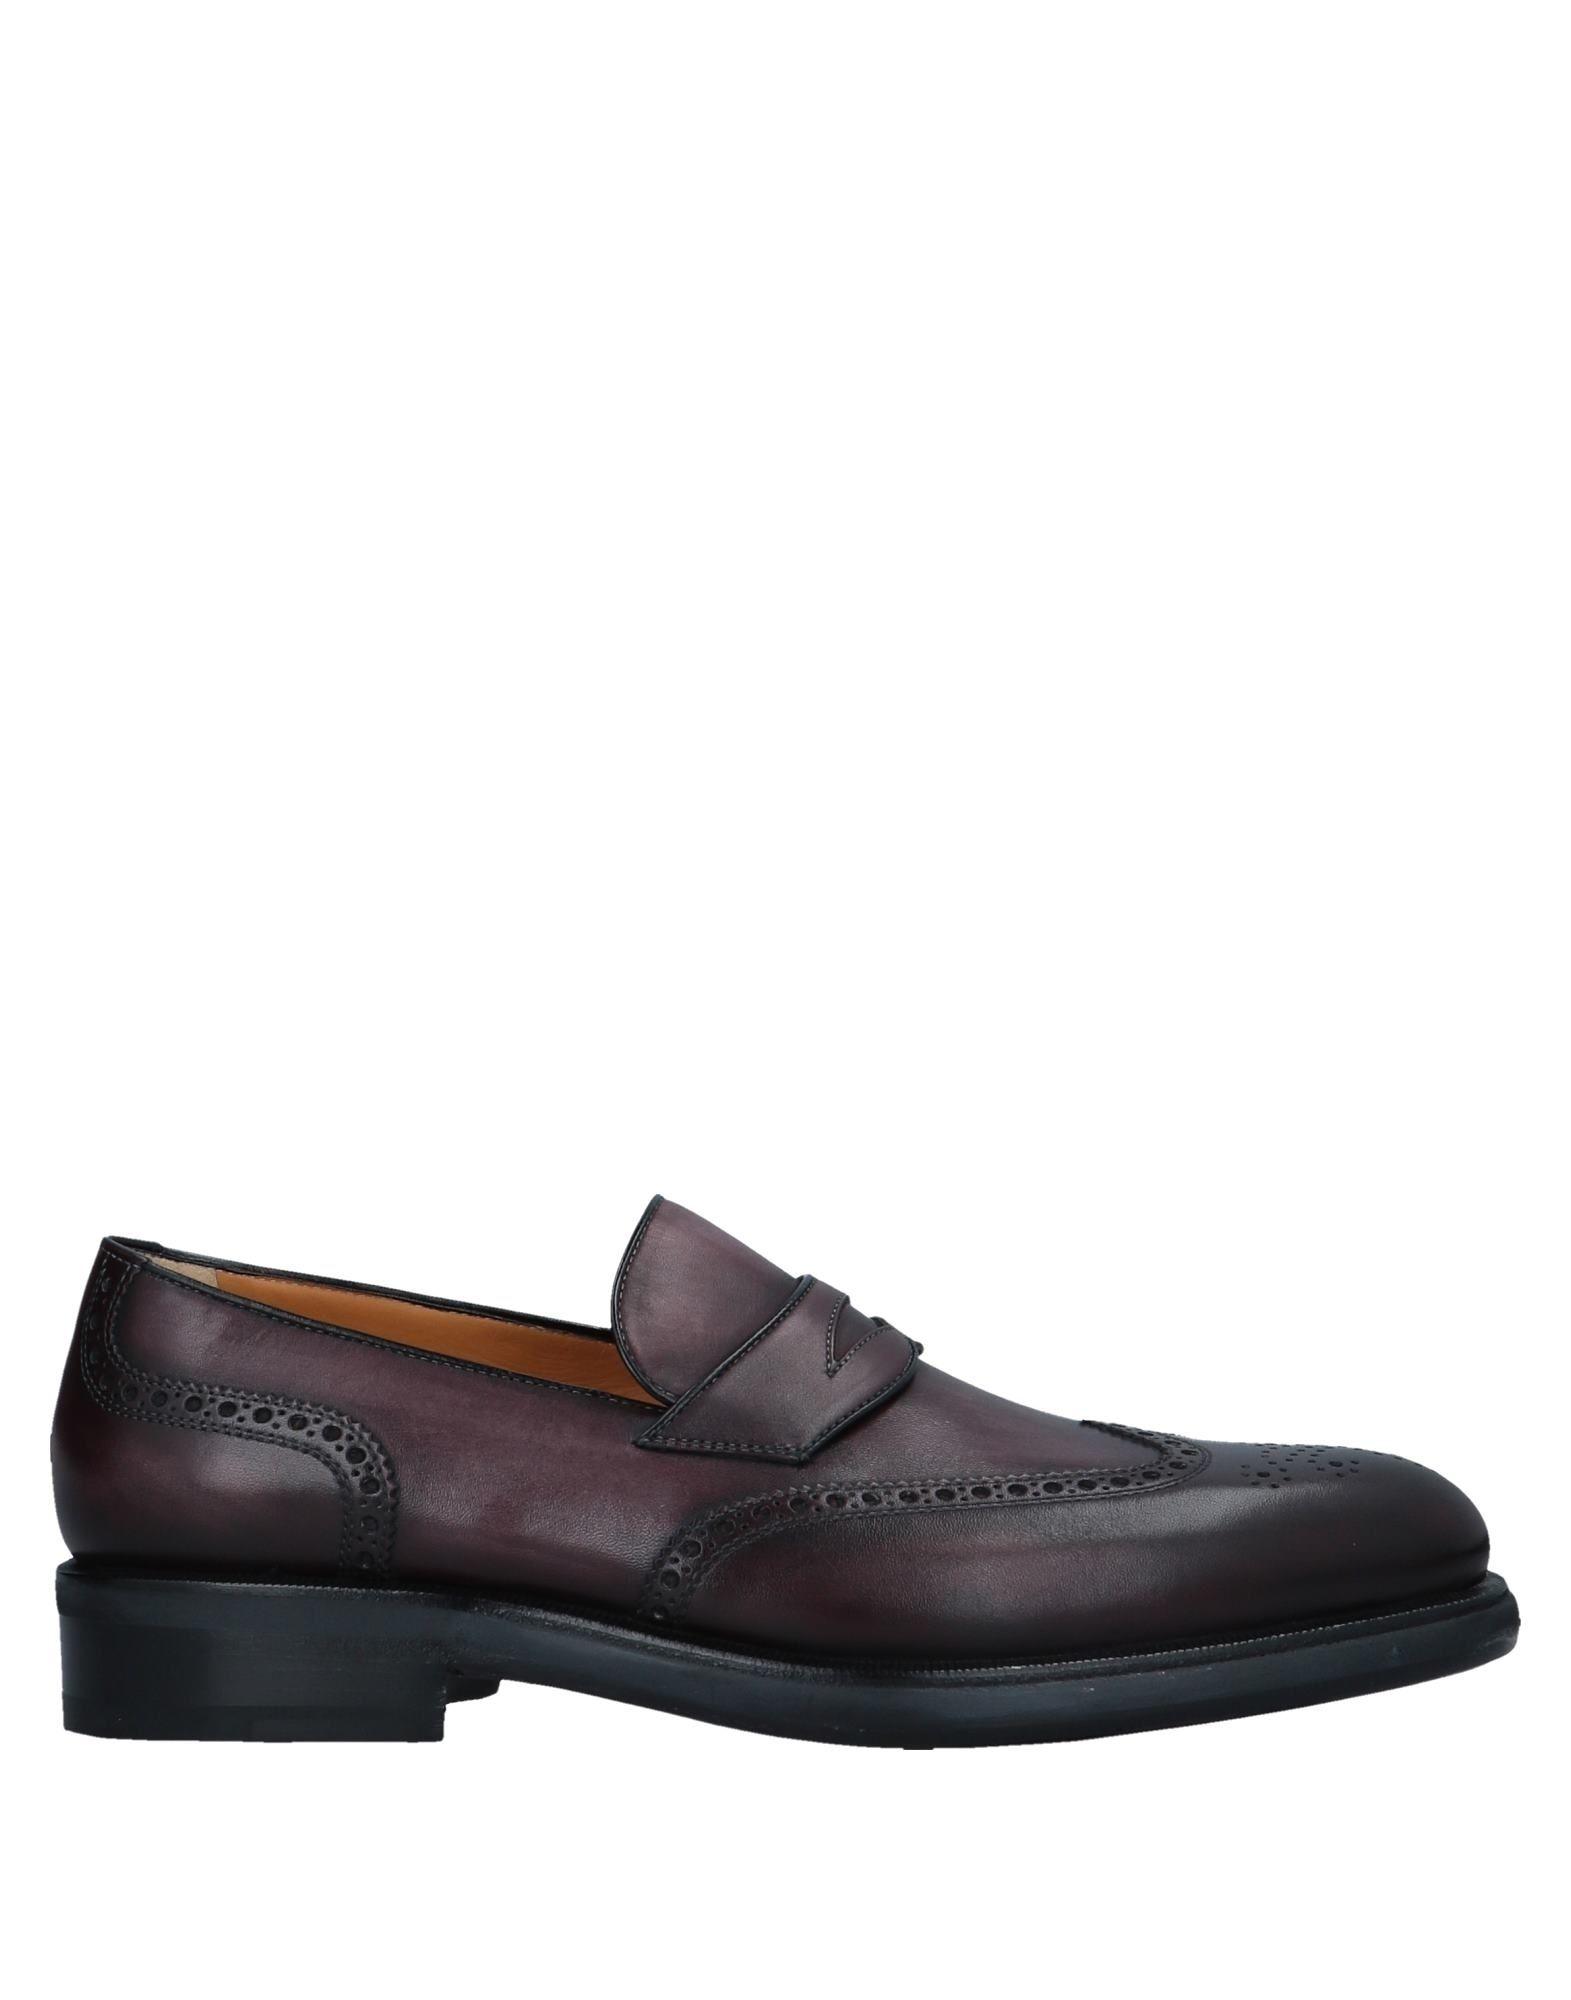 A.Testoni Mokassins Herren  11543689LG Gute Qualität beliebte Schuhe